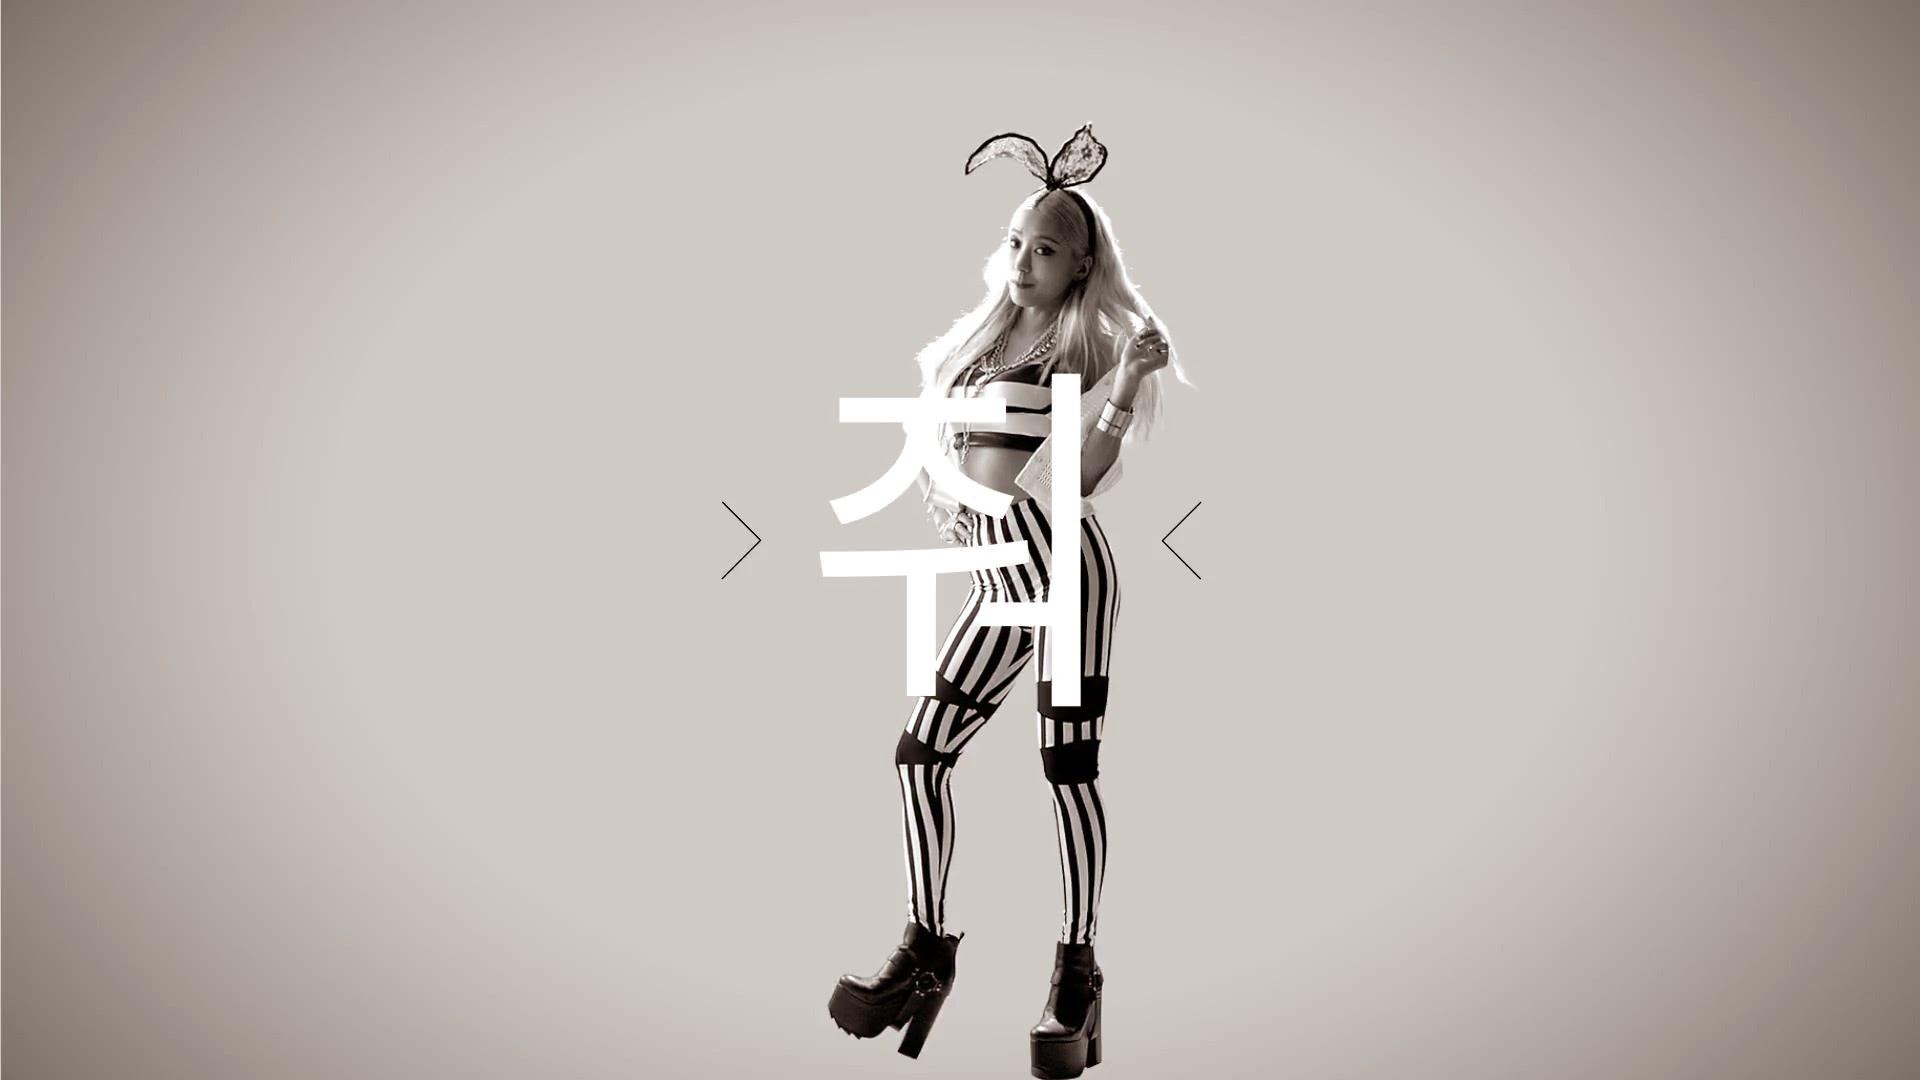 SISTAR's Bora in Kisum x Lil Cham x Jace x Bora x Adoonga Feedback MV